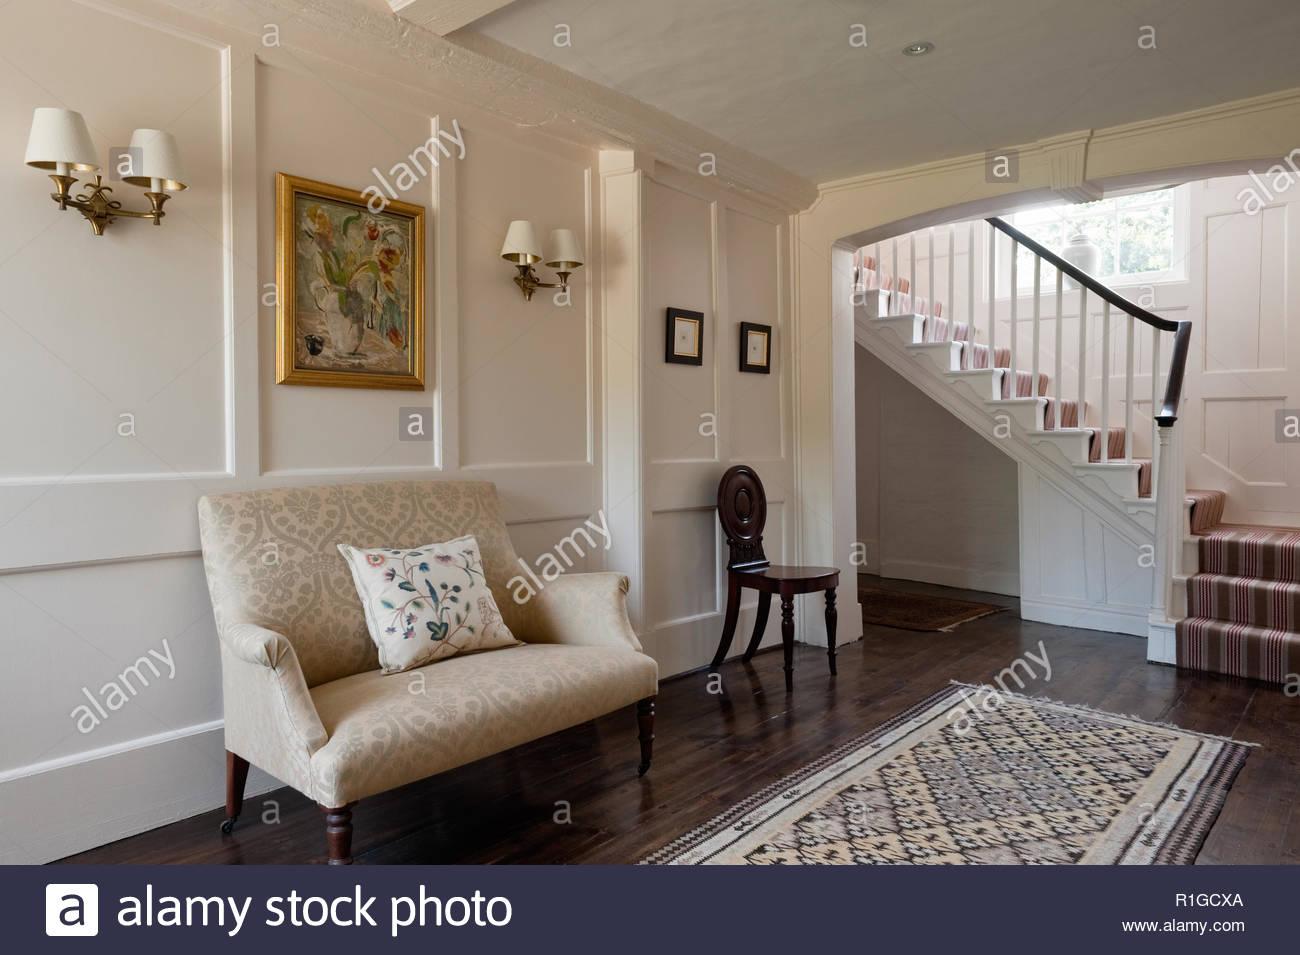 übergroße Sessel Im Eingangsbereich Stockfoto Bild 224710818 Alamy